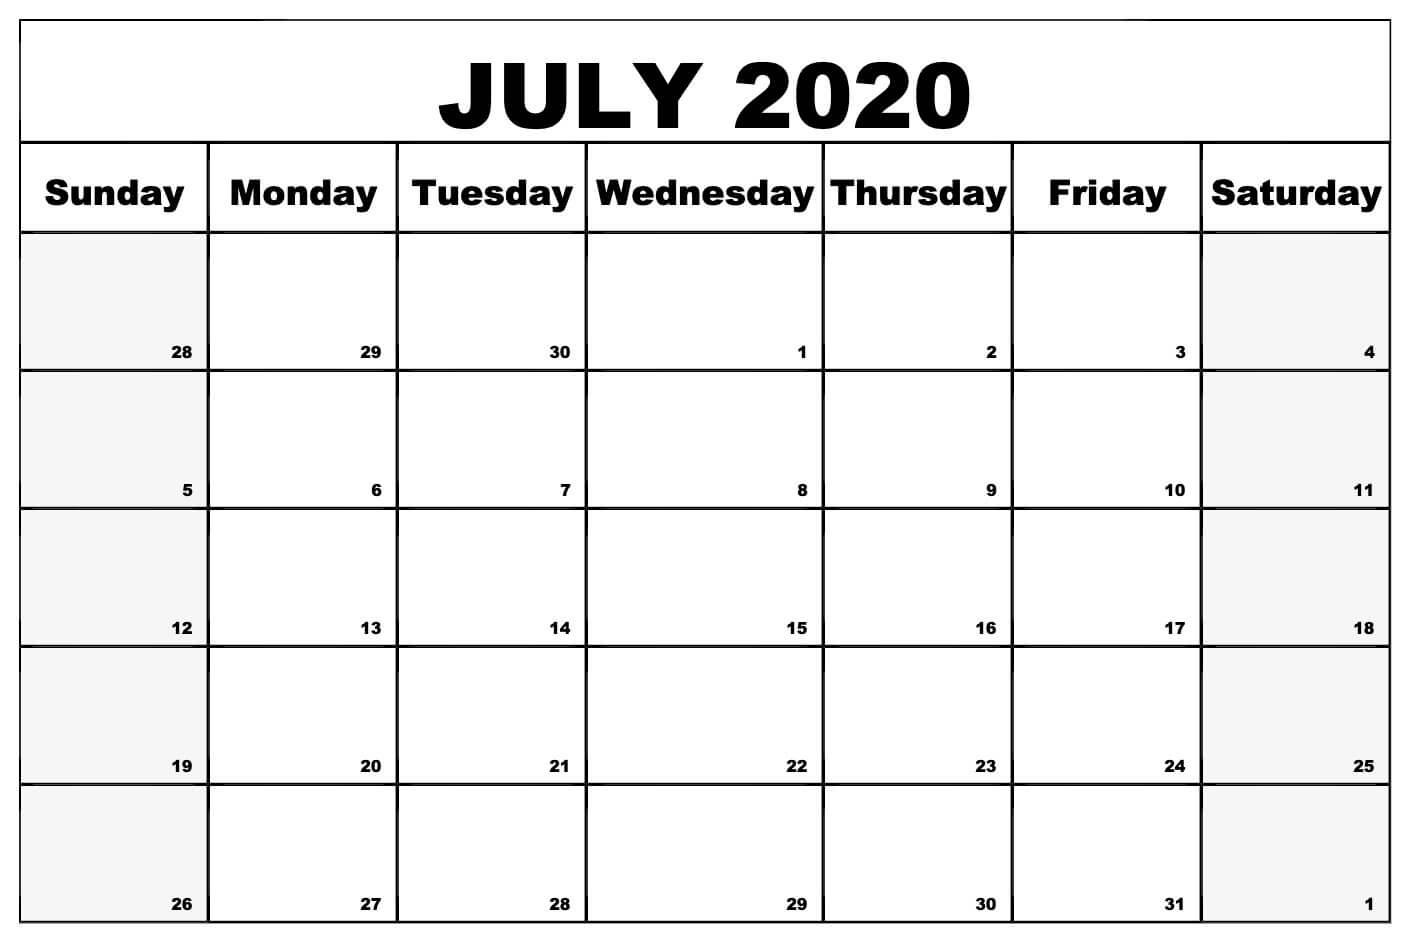 Blank July 2020 Calendar Template